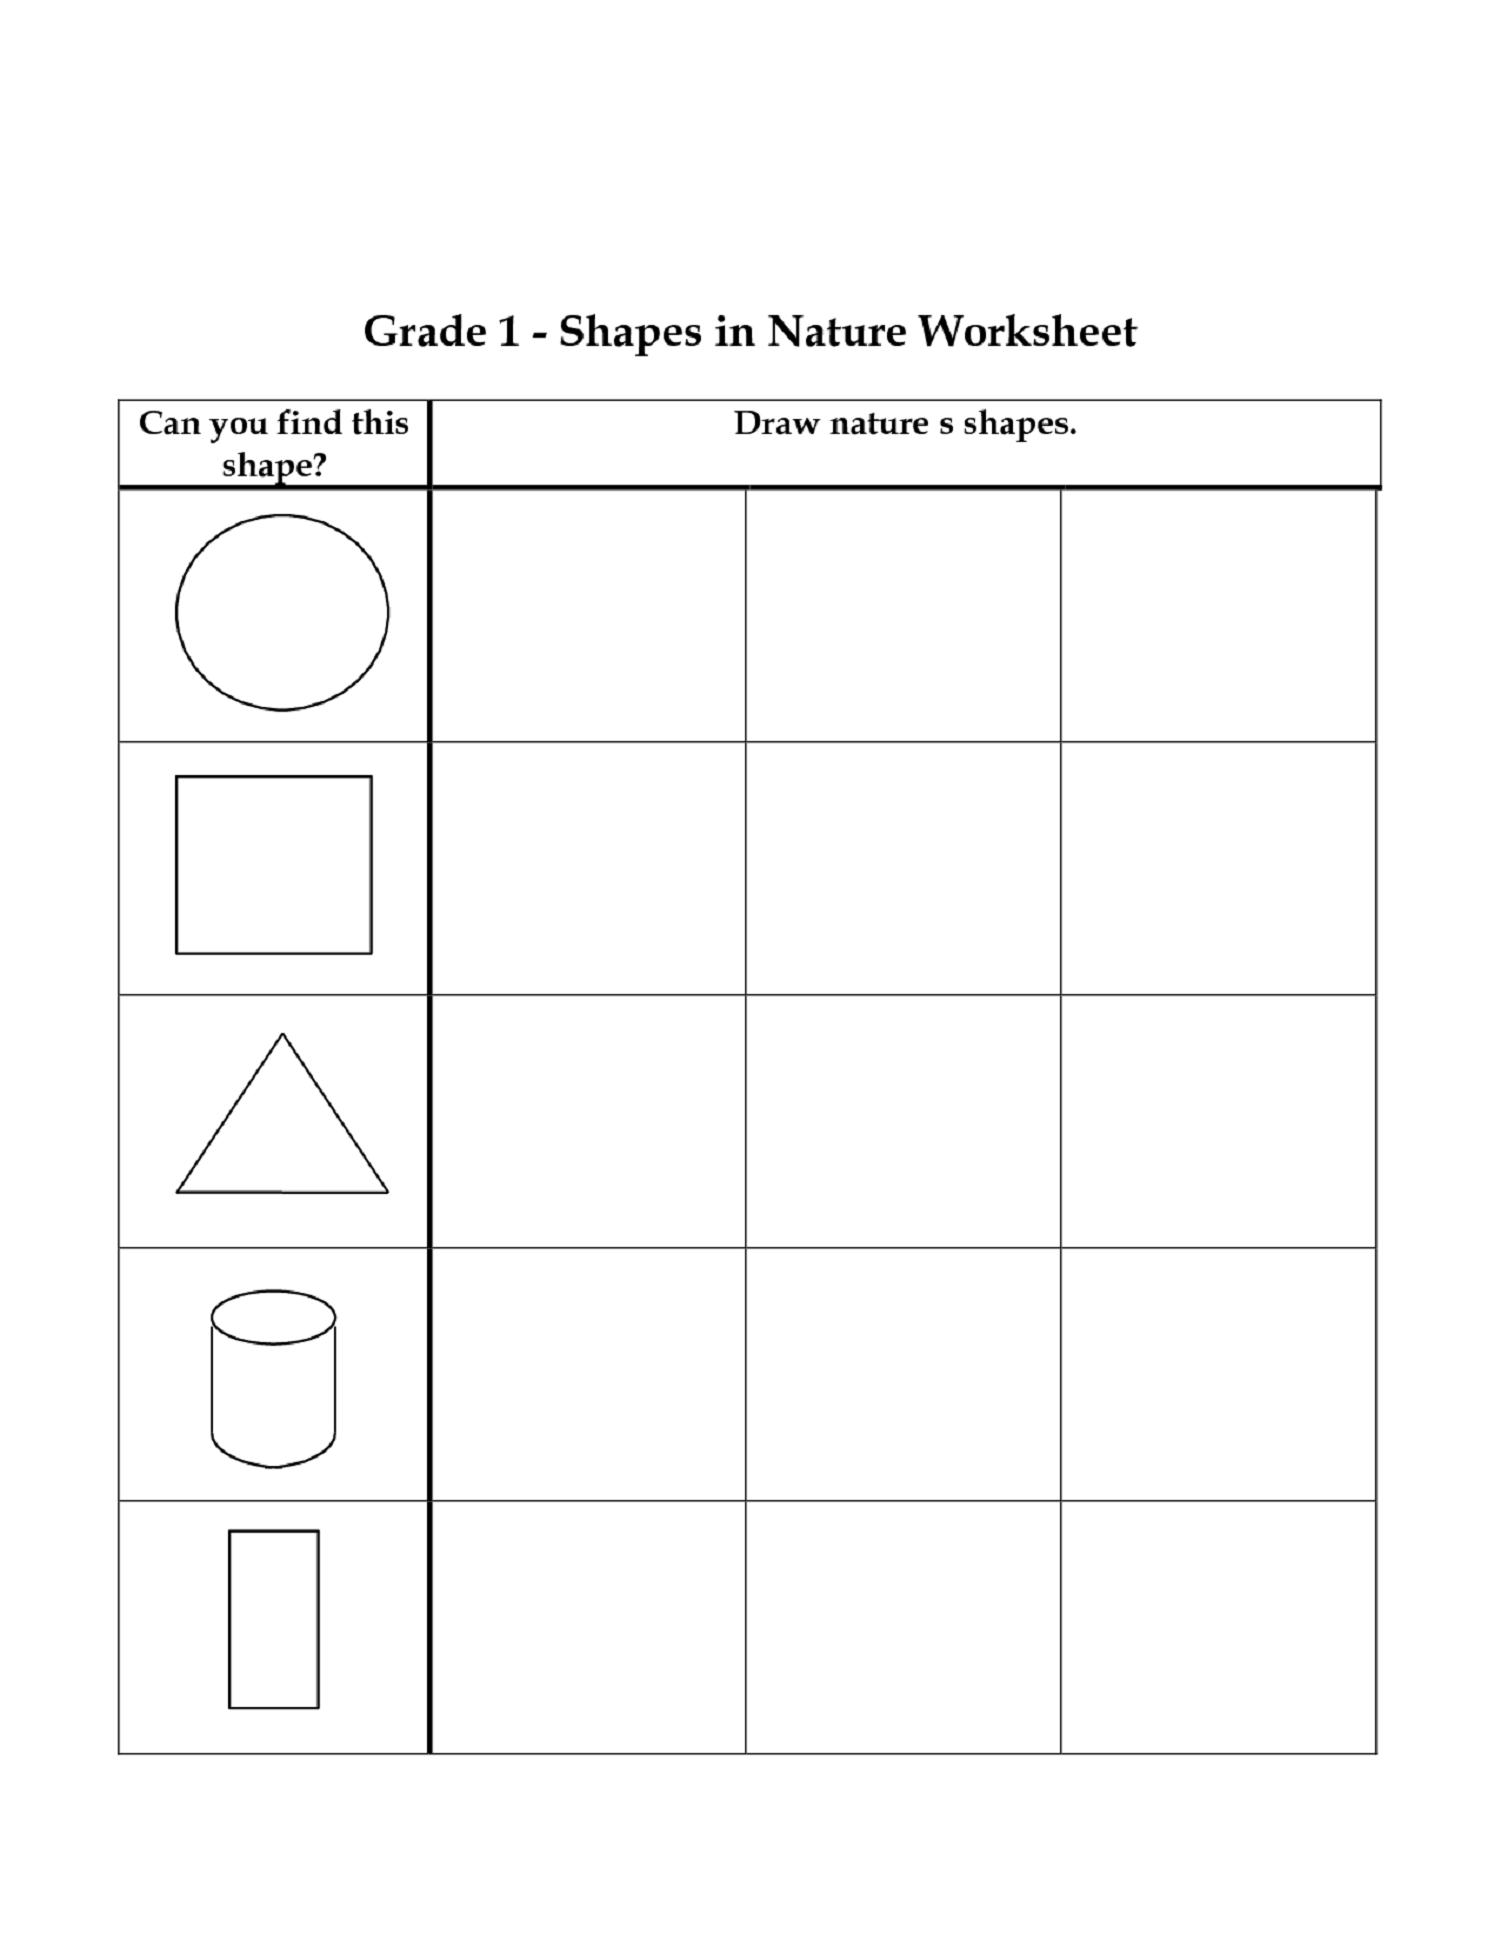 maths worksheets for grade 1 download grade 1 worksheets for learning activity activity shelter 1 download worksheets maths for grade